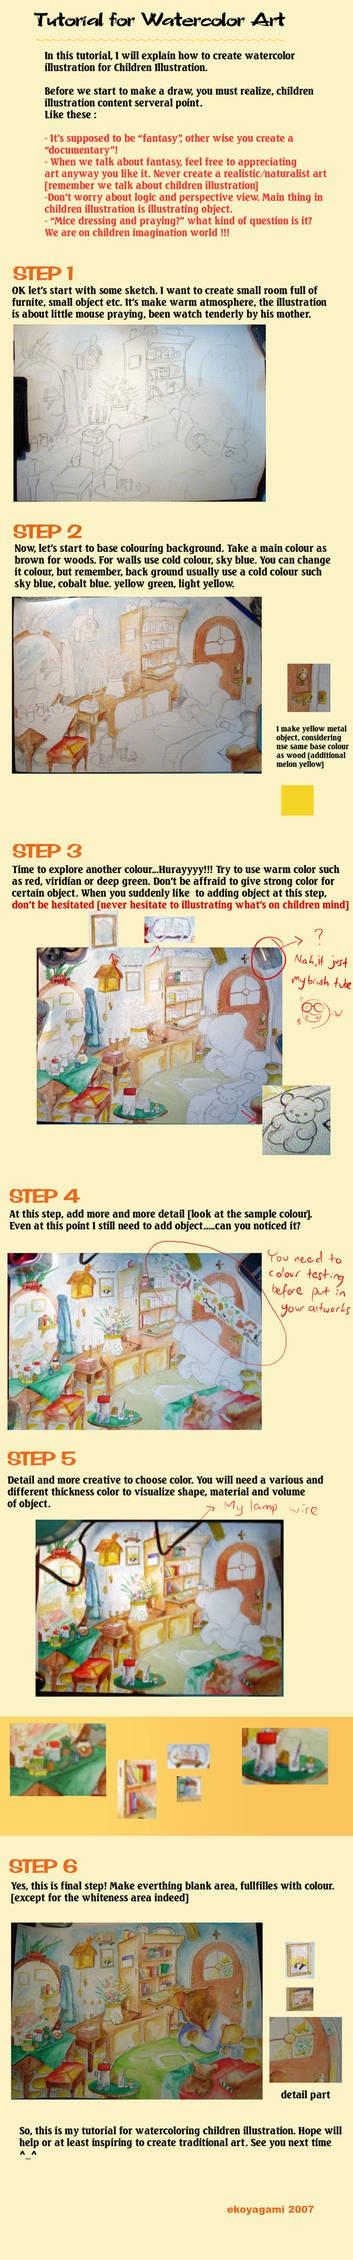 tutorial for watercolor by ekoyagami